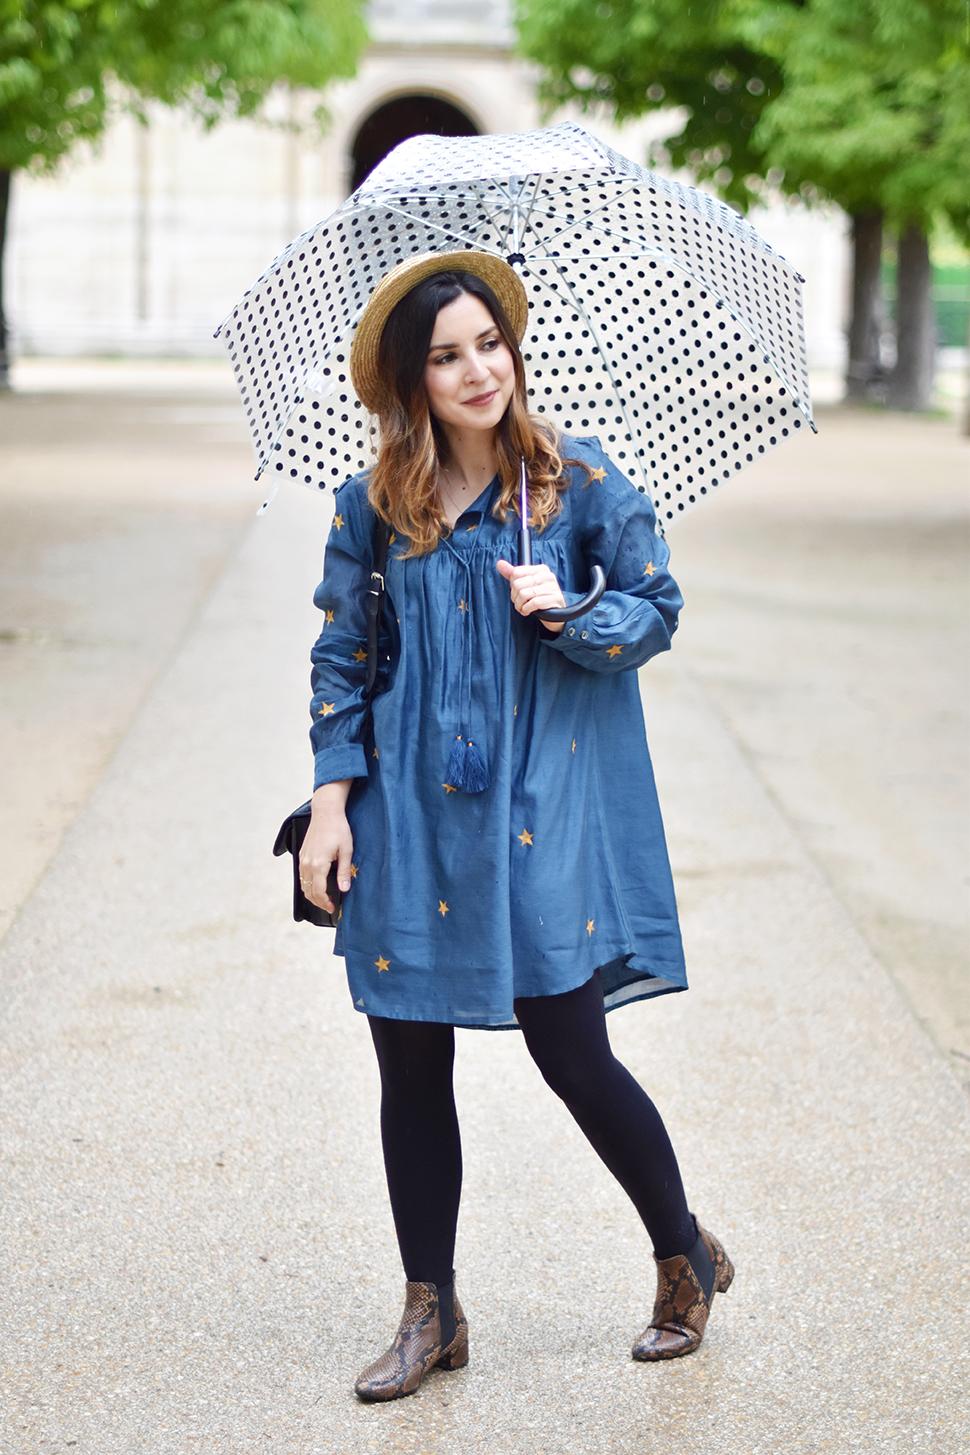 Helloitsvalentine_umbrella_3